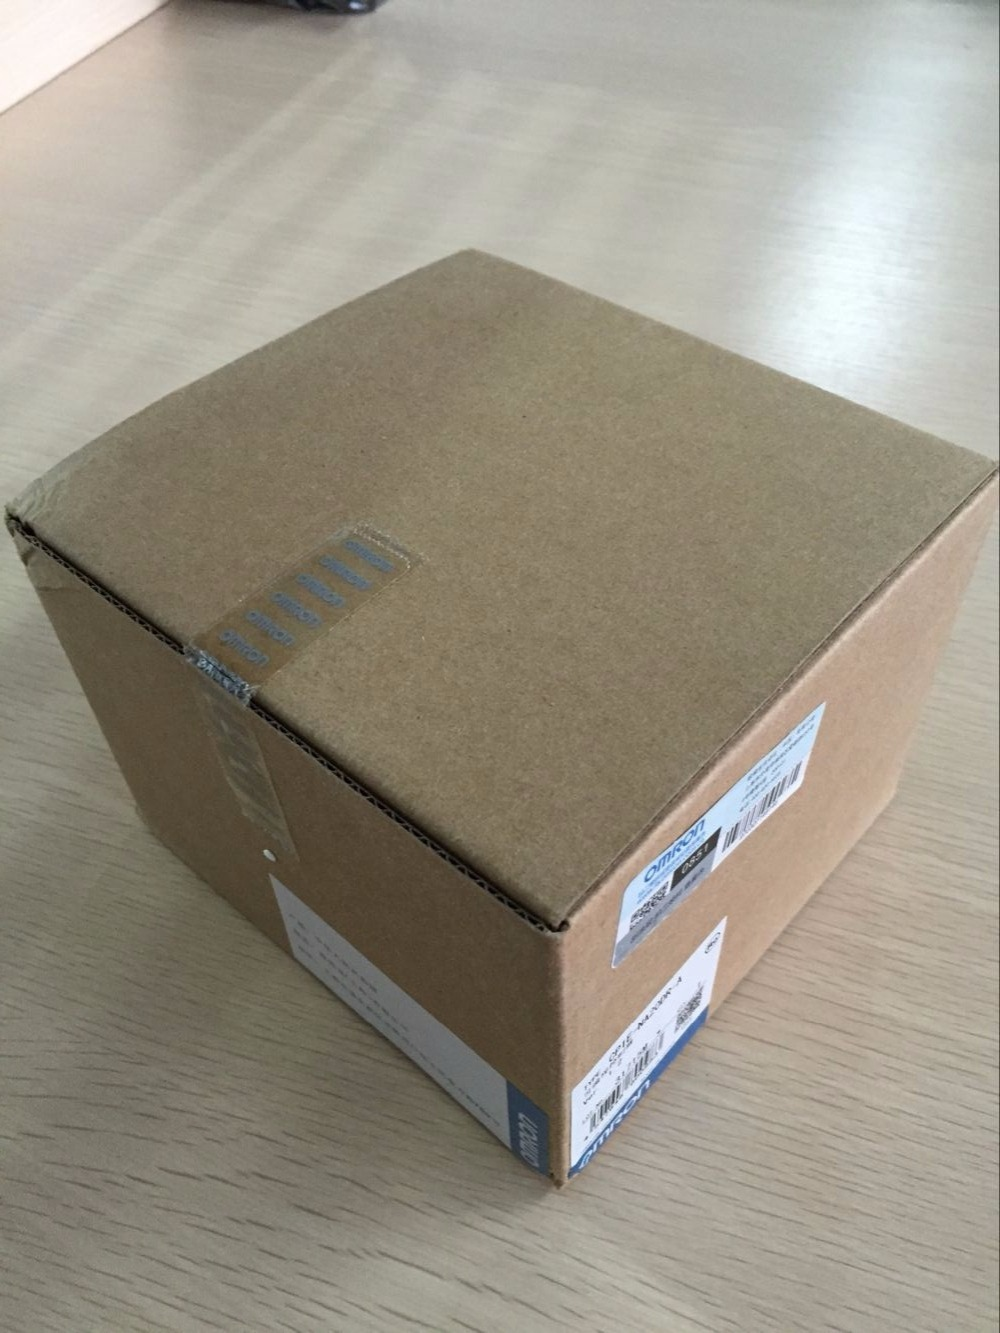 New&amp;Original 232-0HB22-0XA8 EM232 6ES7232 6ES7 well tested working three months warranty<br><br>Aliexpress